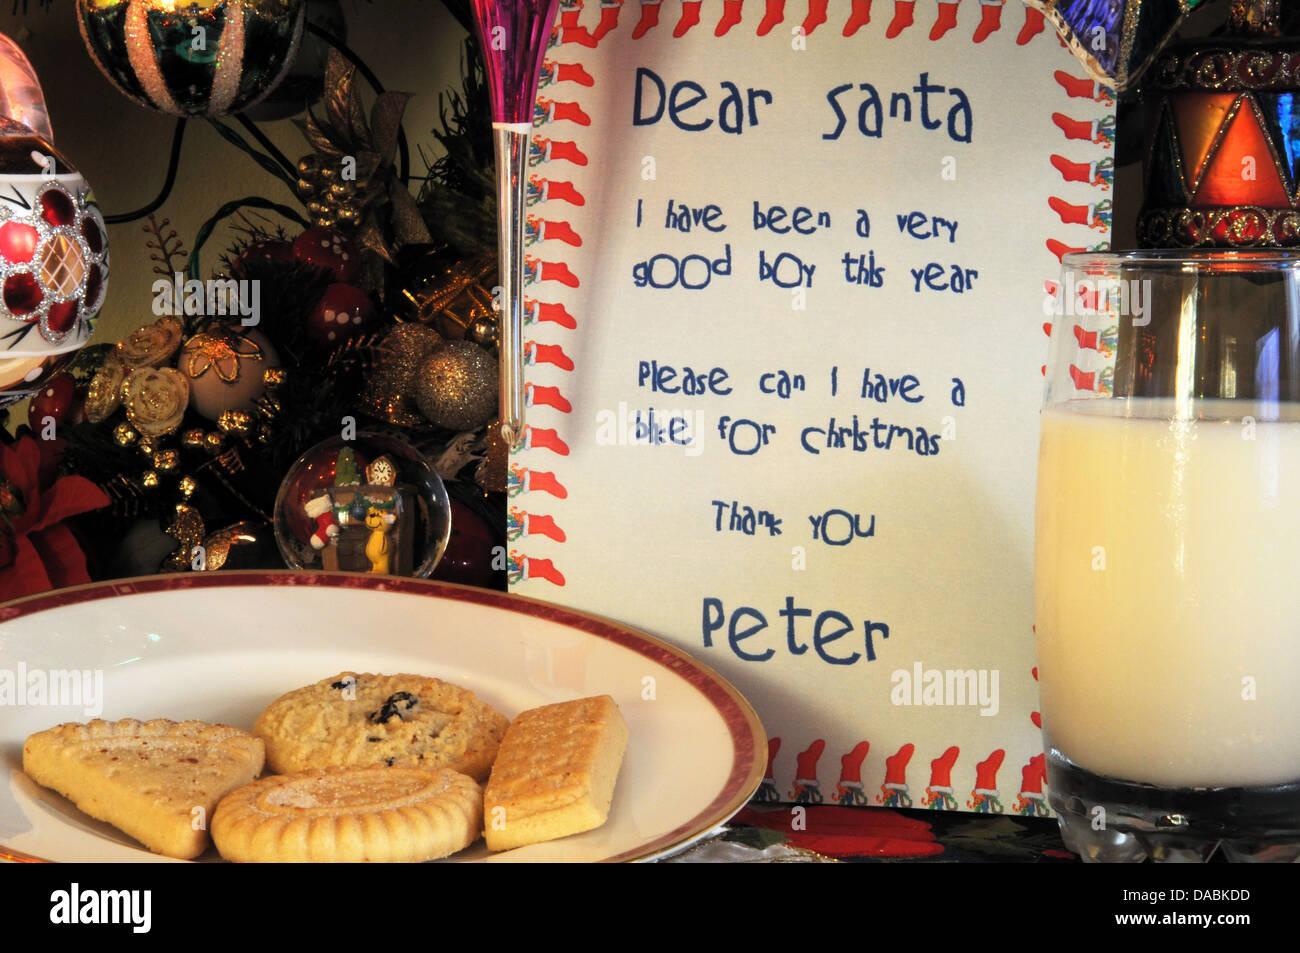 Dear Santa Letter With Milk